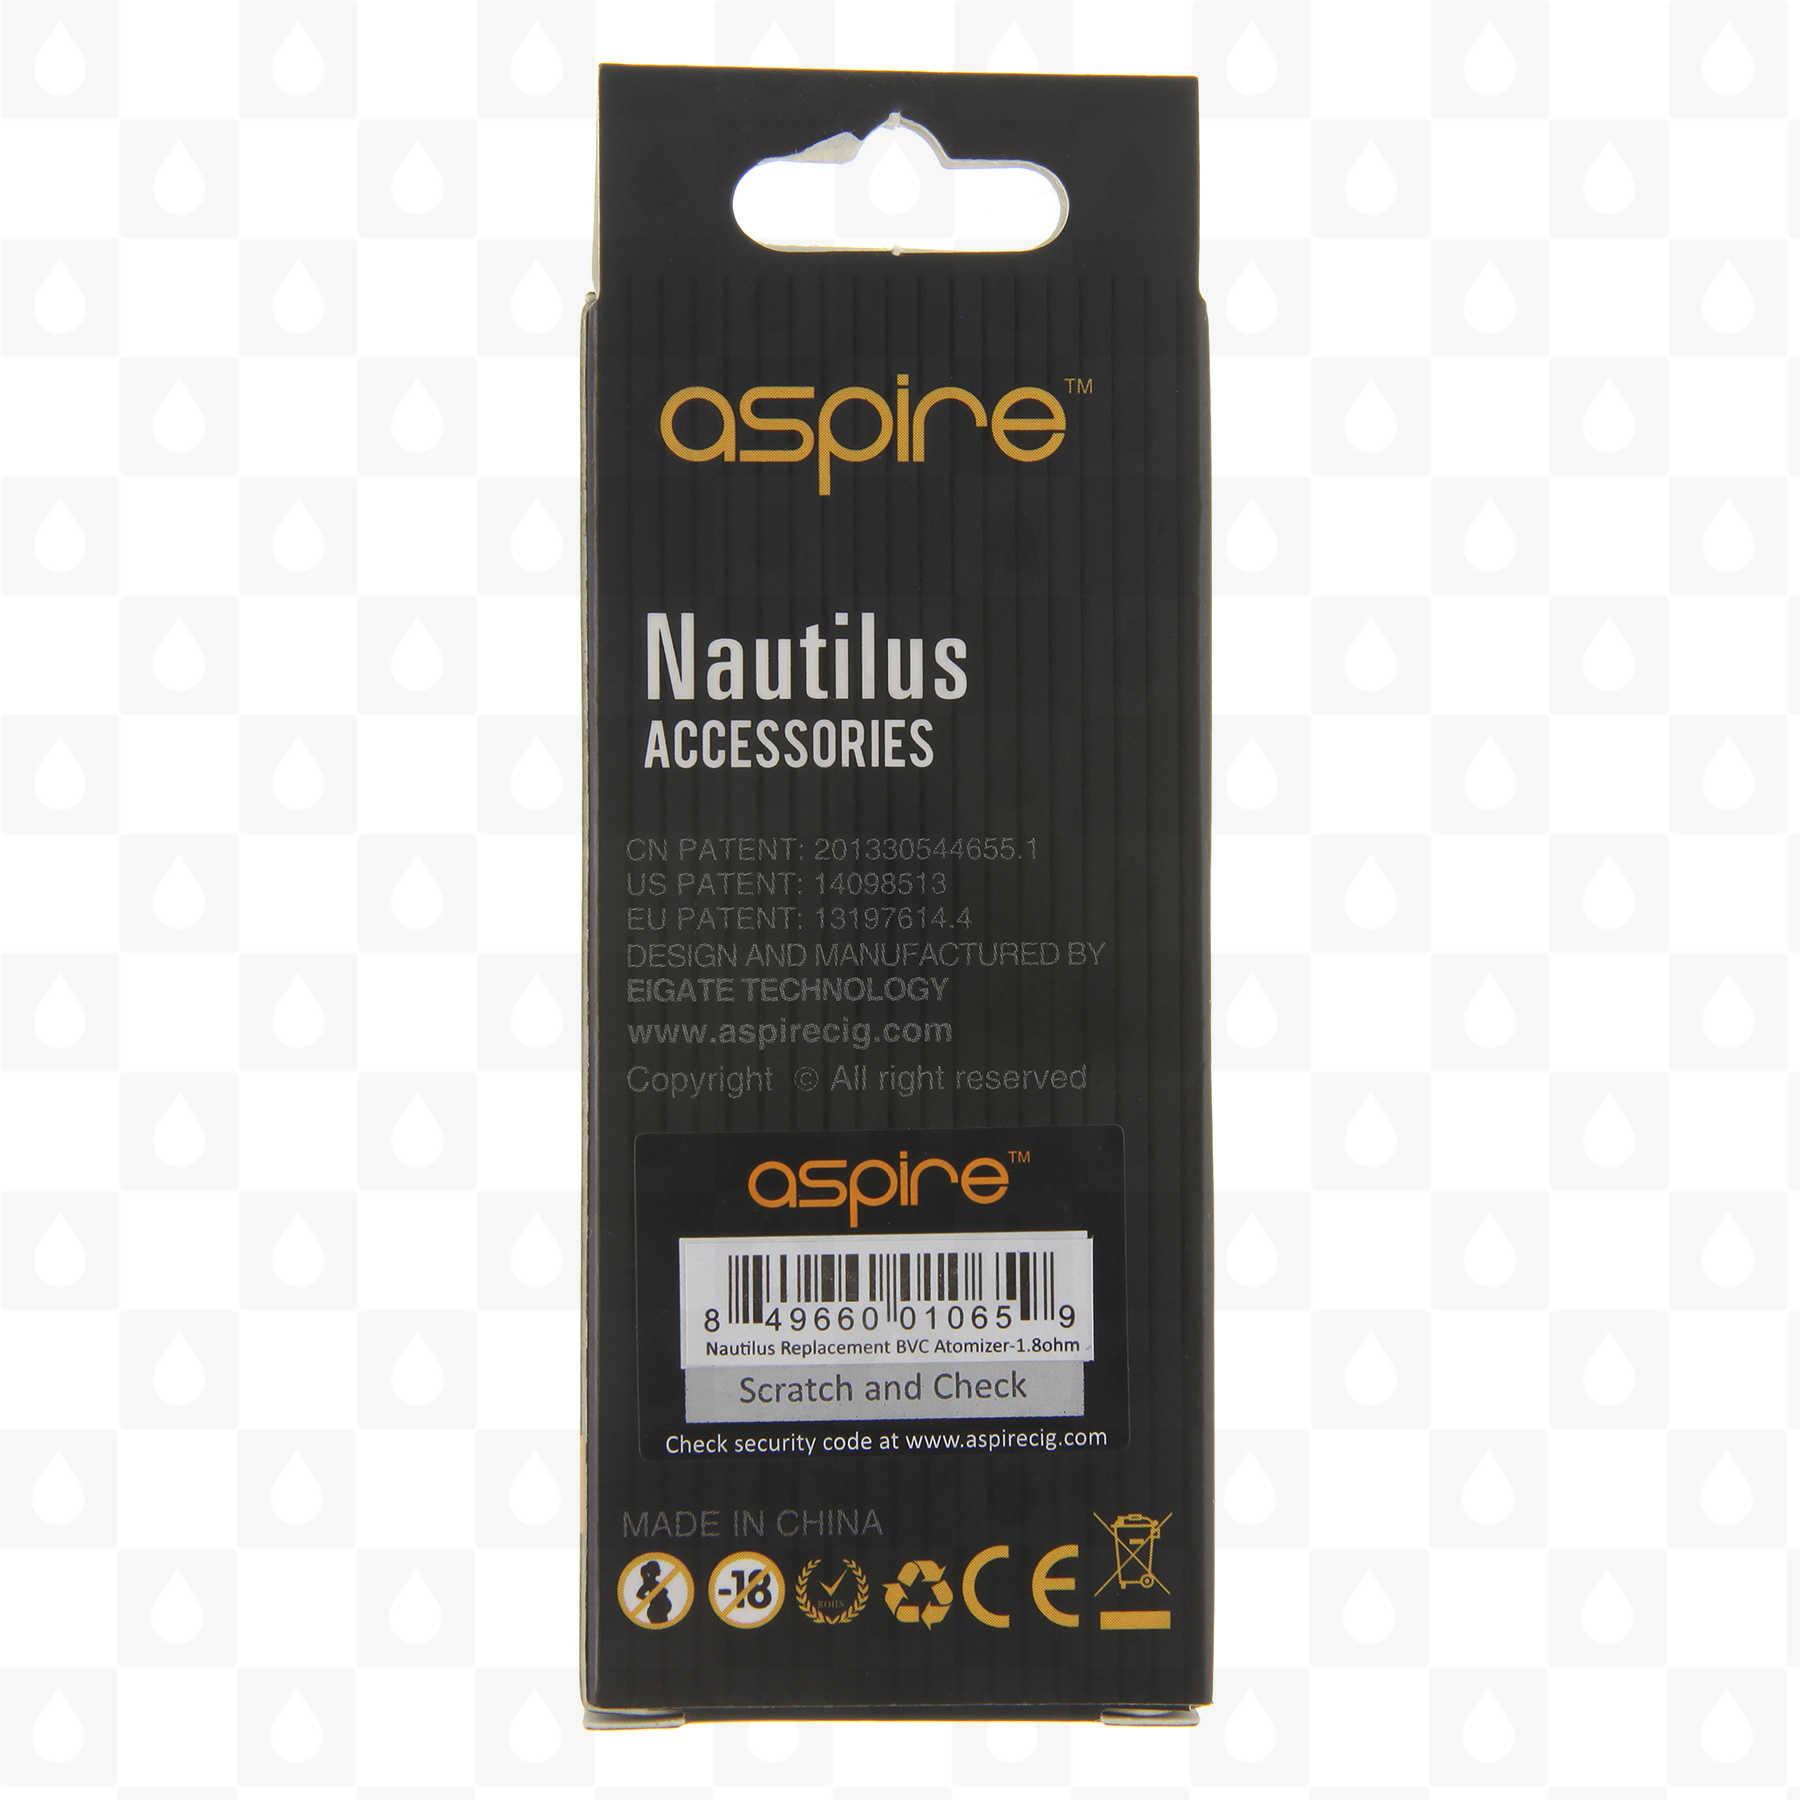 Aspire Nautilus Bvc Organic Cotton Replacement Coils Box Of Five Uk Vape Shop Redjuice